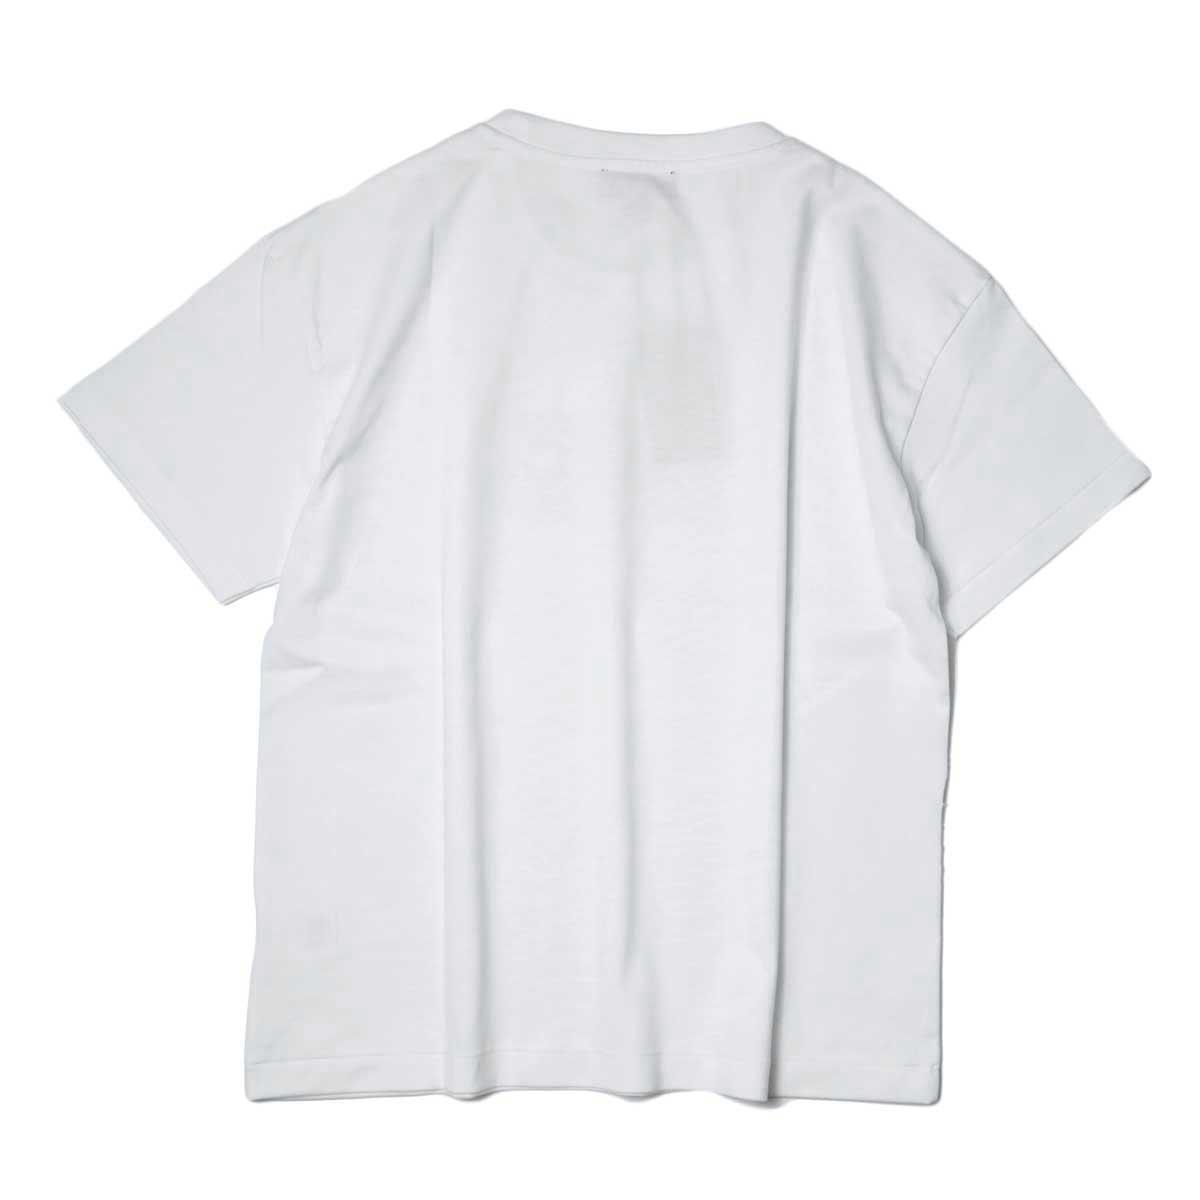 A.P.C. / Judy Tシャツ (White) 背面